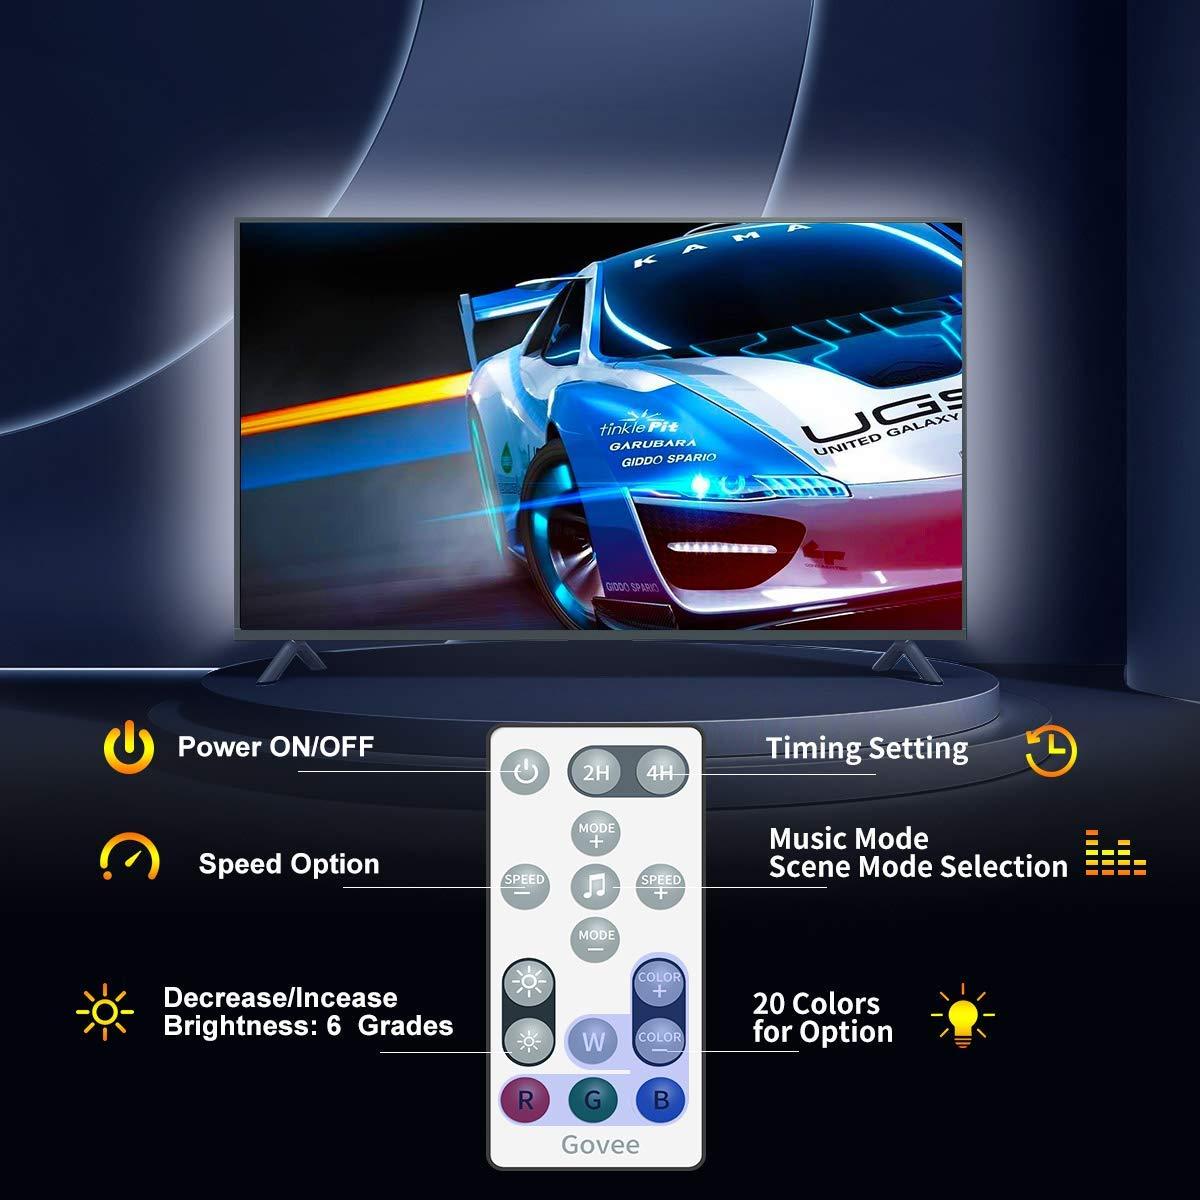 MEHRWEG 32 Farben 7 Szenen-Modi Stimmungsbeleuchtung LED Streifen LED TV Hintergrundbeleuchtung Govee 3M USB LED Strip Lichtband mit Fernbedienung f/ür 40-60 Zoll LED Beleuchtung Fernseher